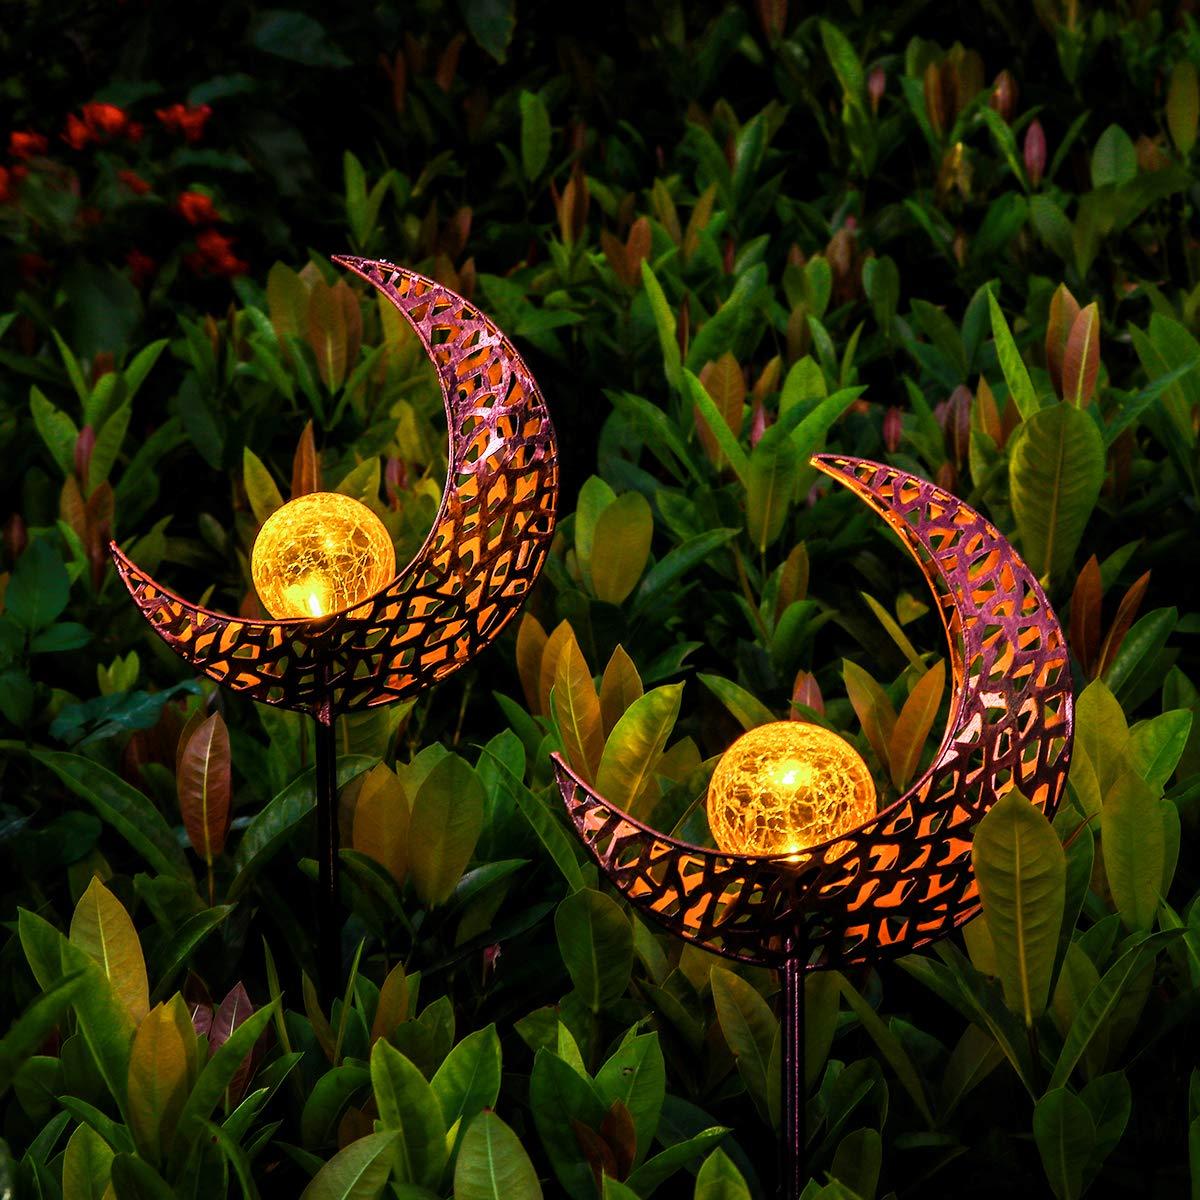 Yunlights 2pack Solar Garden Lights Outdoor Moon Crackle